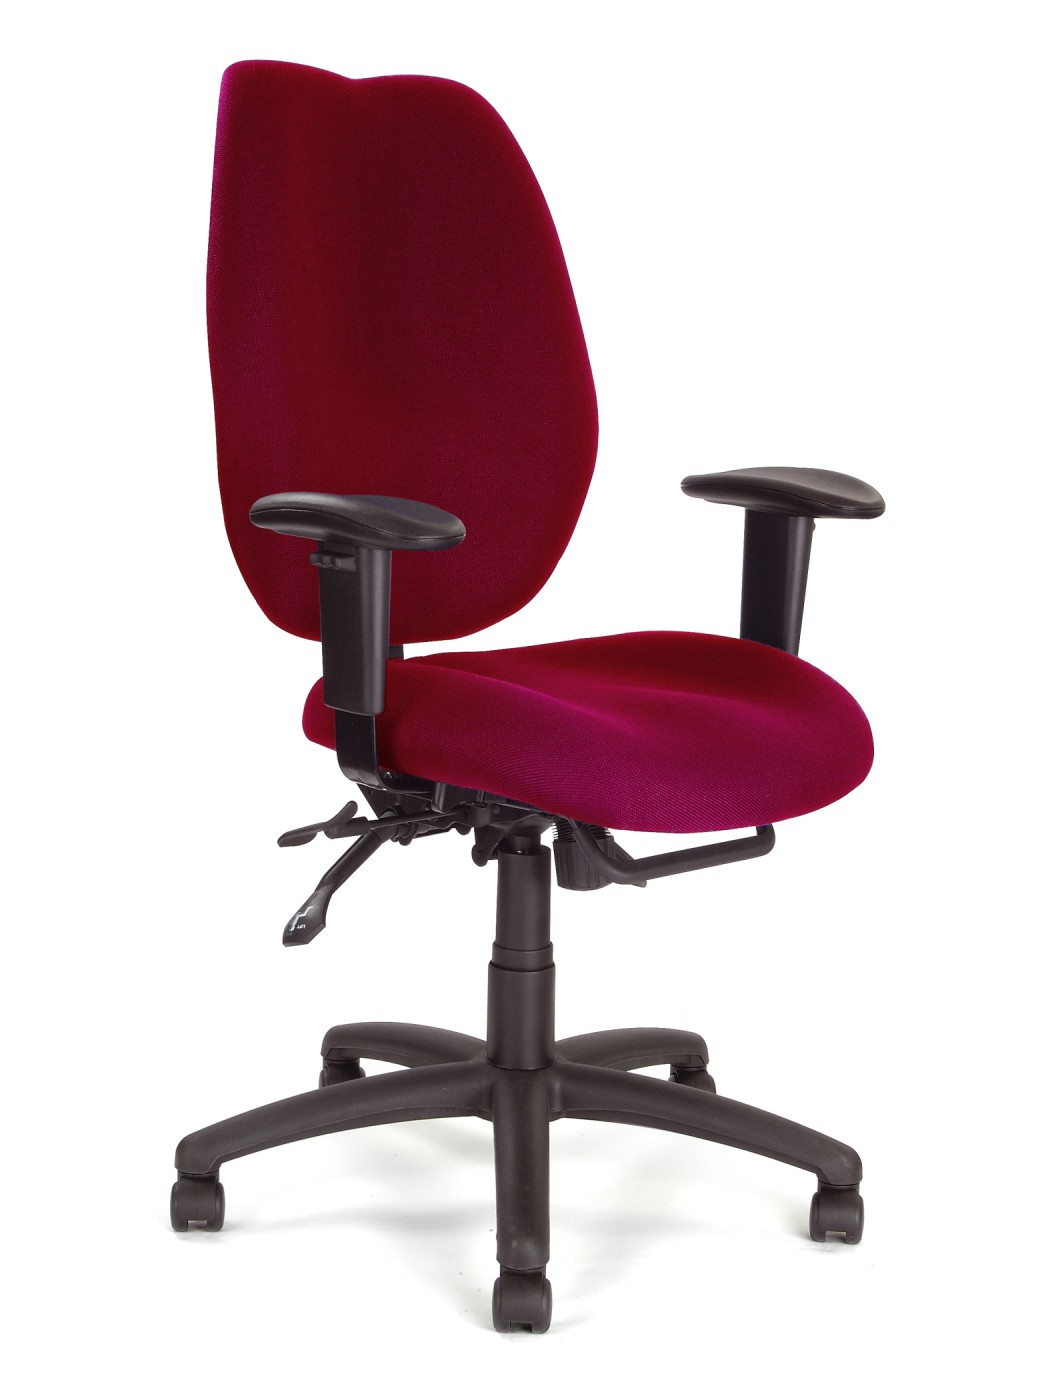 ergonomic office chairs uk desk chair ergonomic design ideas all